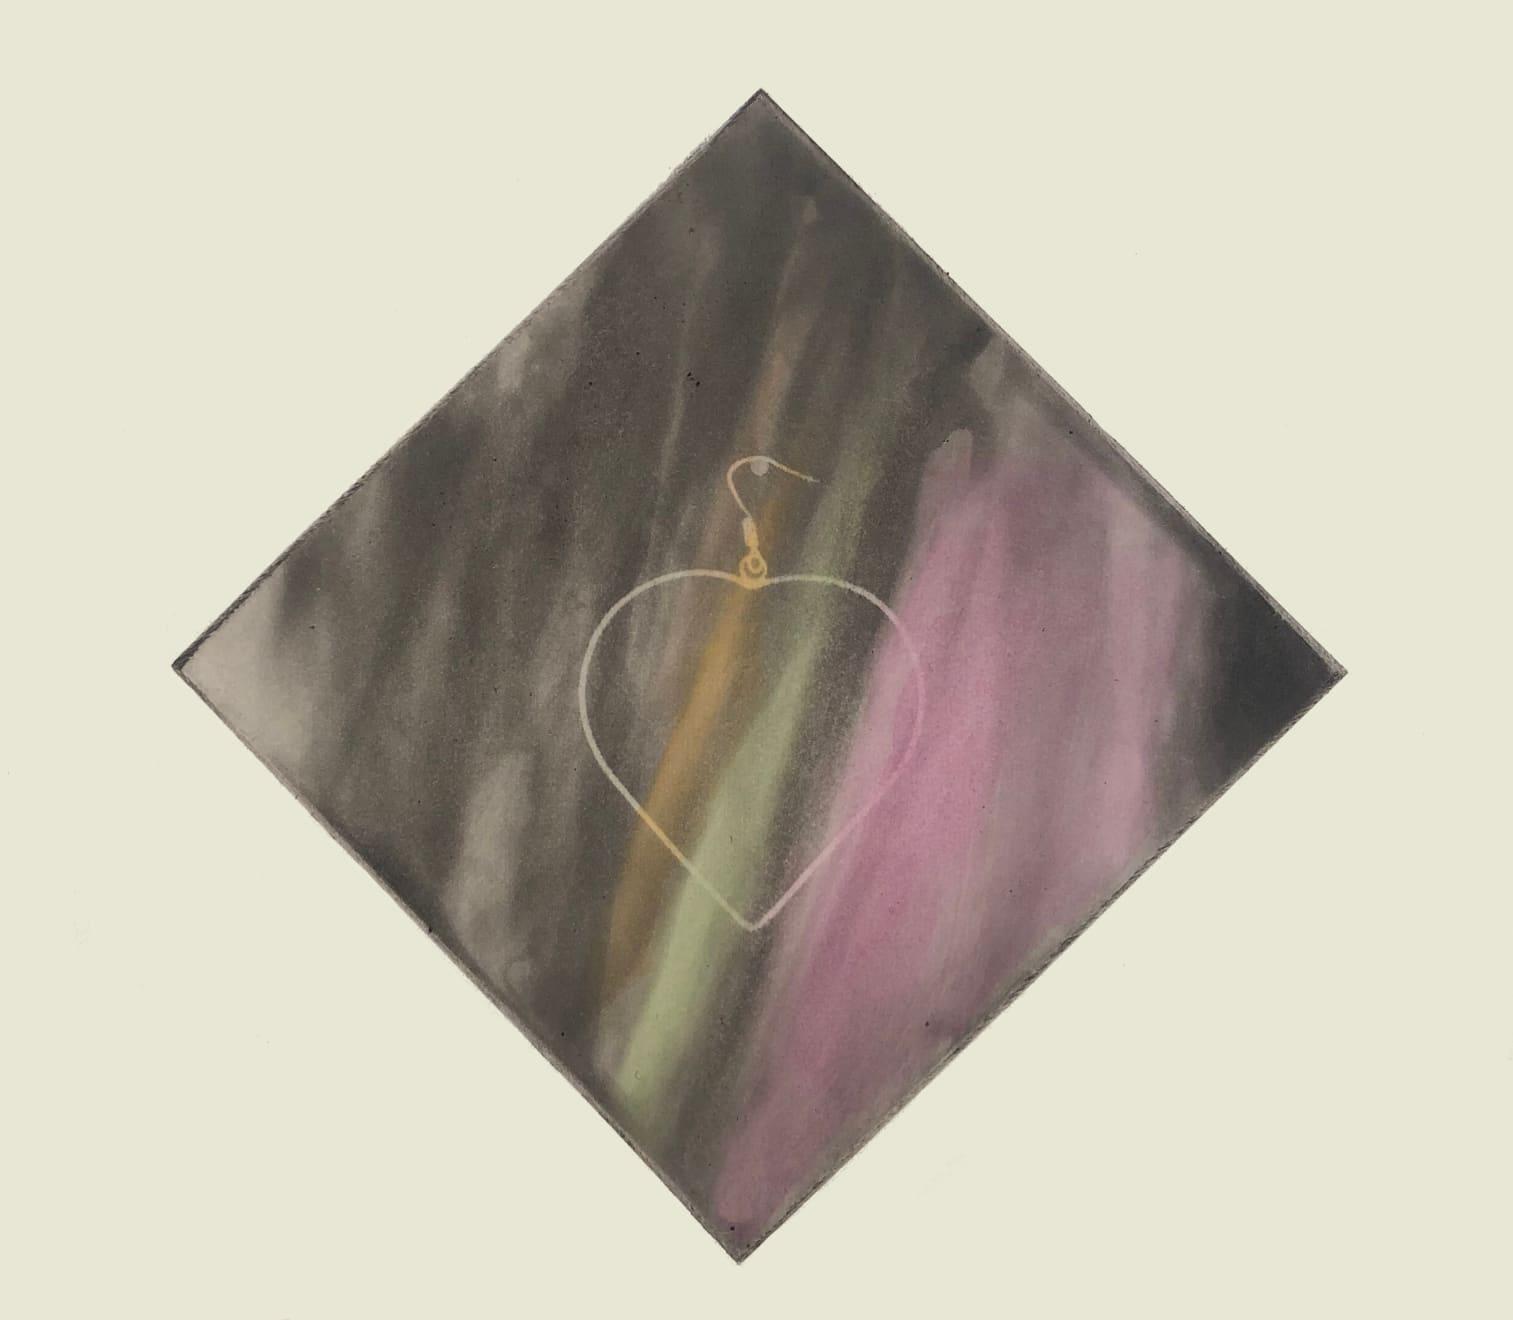 Norman Ackroyd, Lockdown Rainbow No. 5 - Decoration, 2020